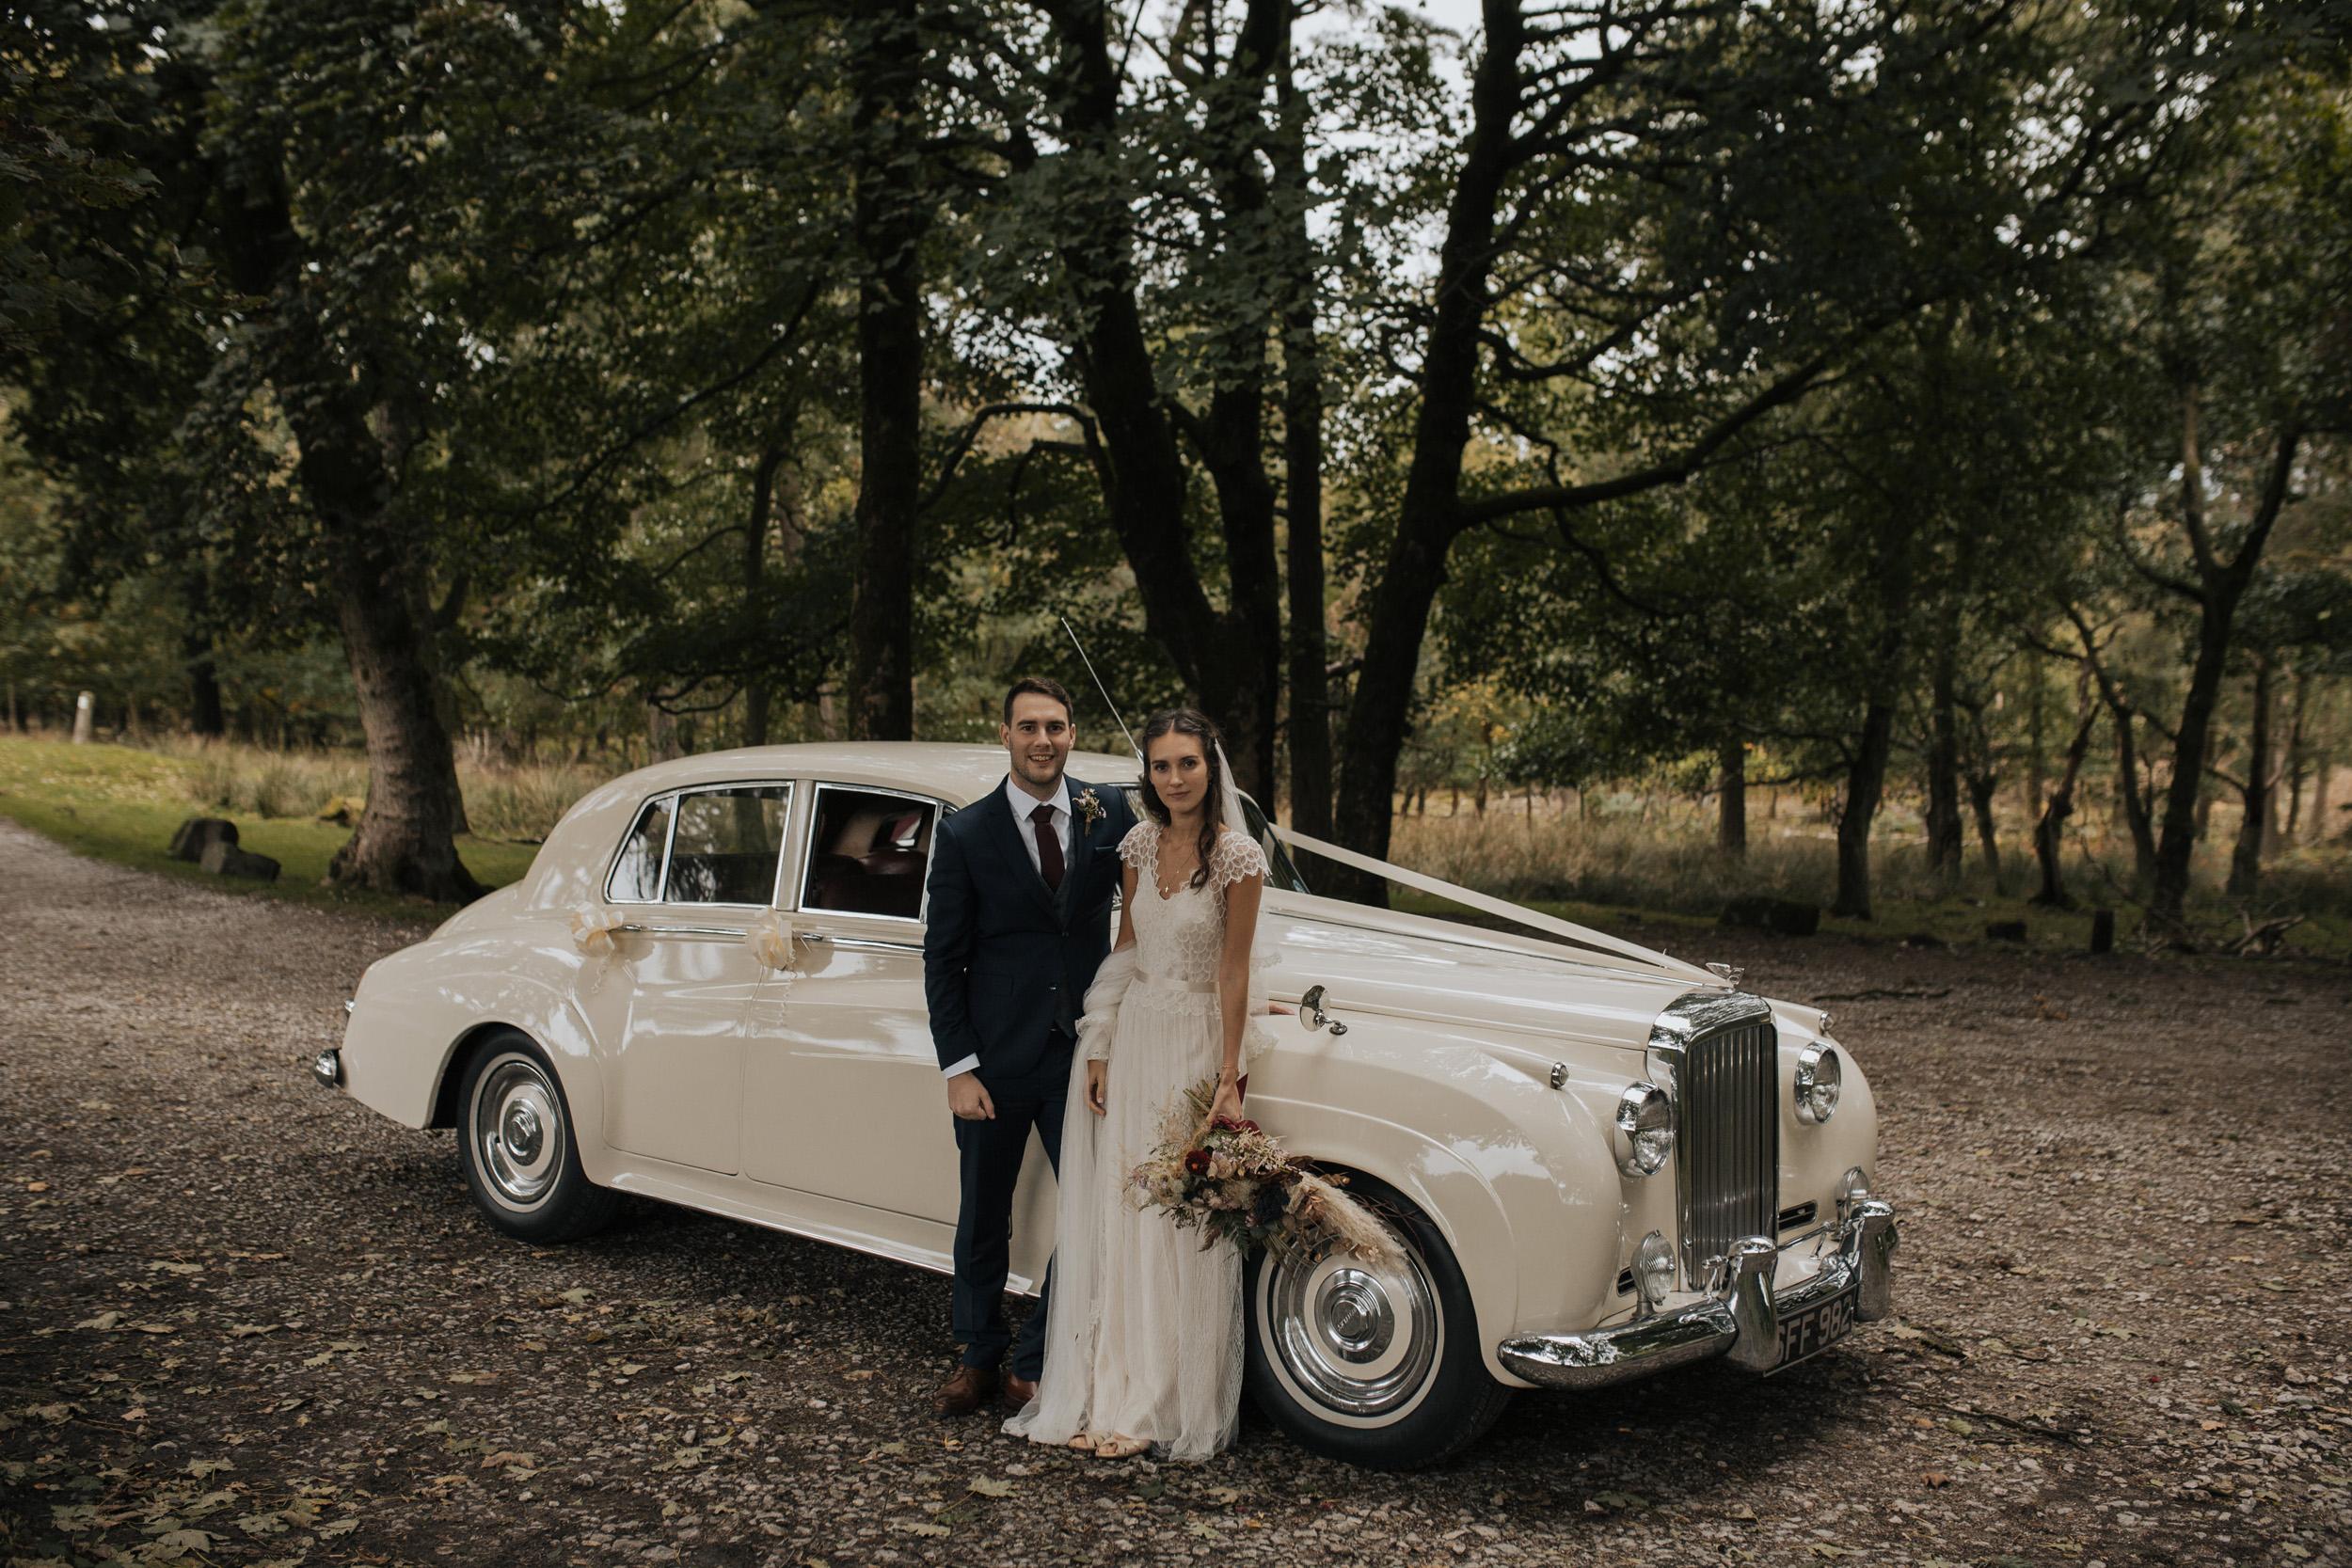 Joasia-Kate-Beaumont-Bohemian-Lace-Wedding-Dress-Peak-District-Sheffield-Wedding-37.jpg